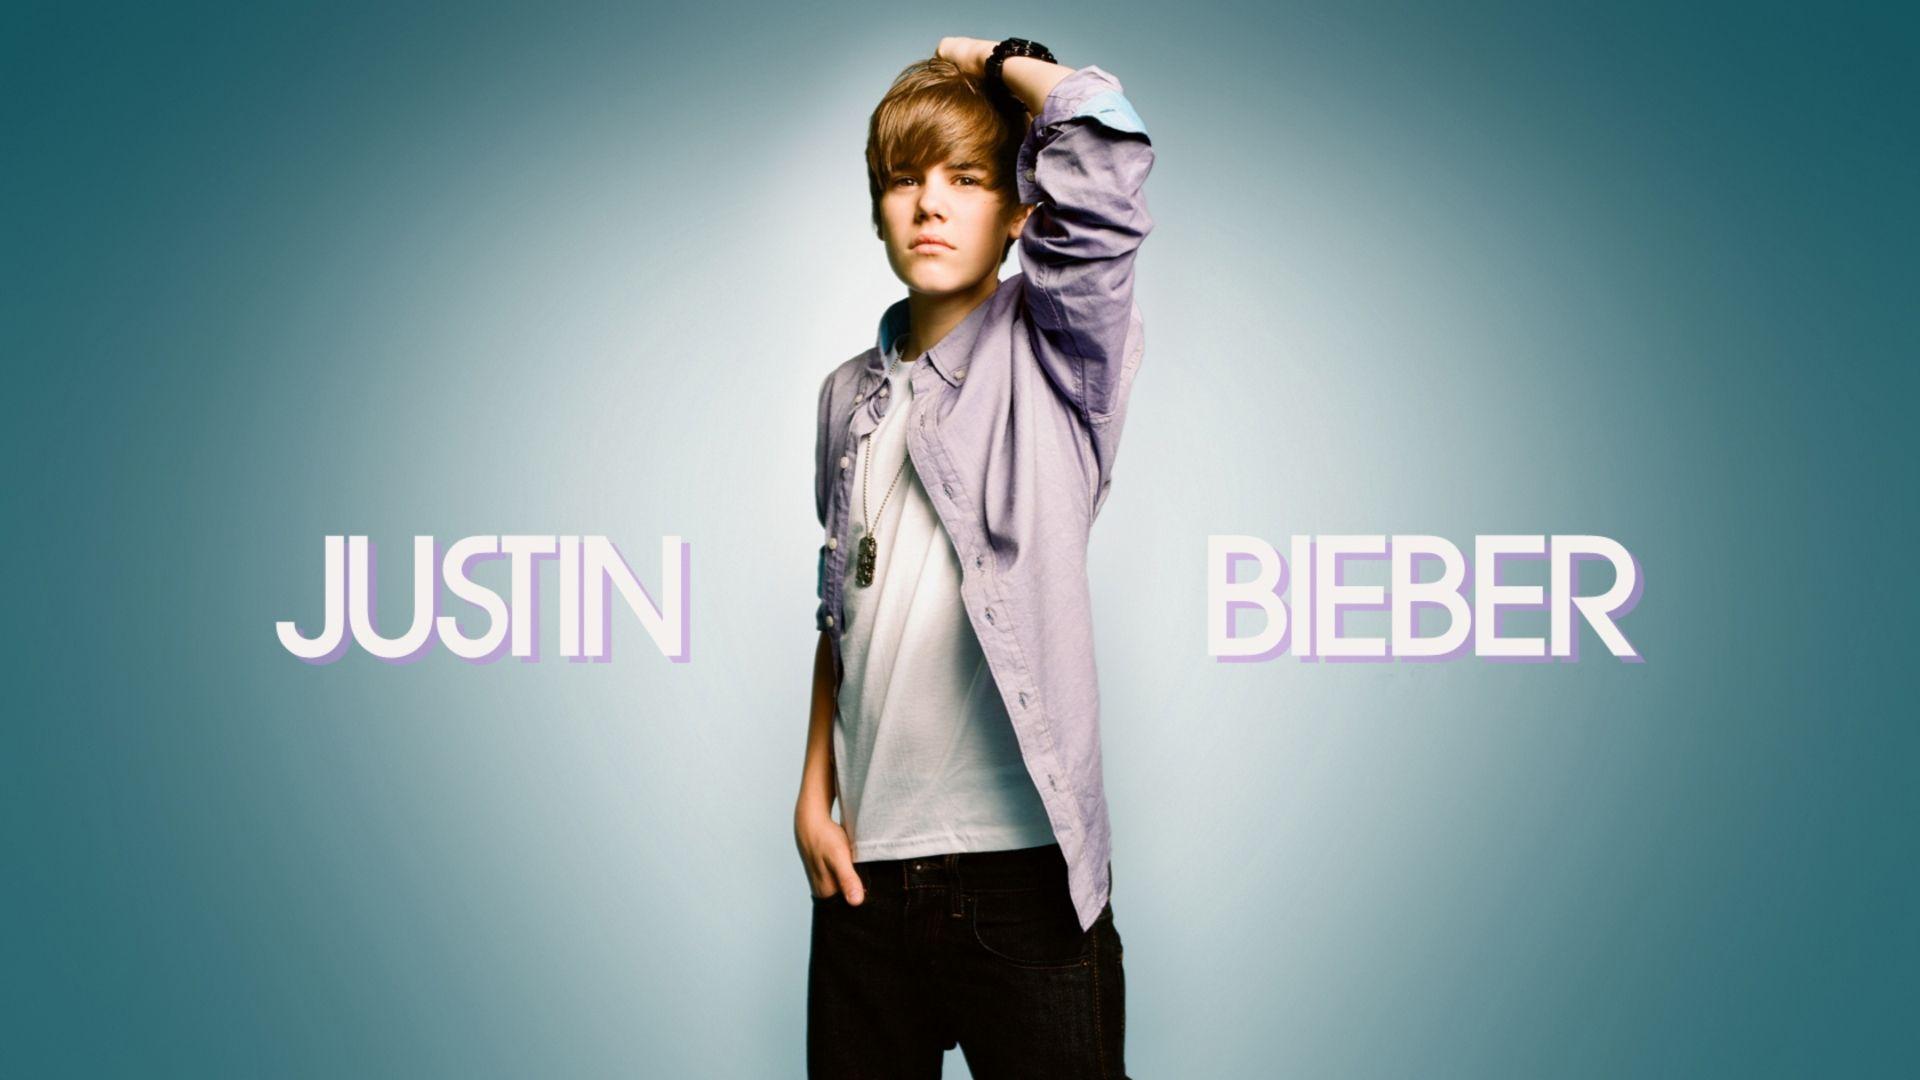 Justin Bieber Wallpapers Hd Wallpaper 1920 1080 Justin Bieber Image Wallpapers 68 Wallpapers Ad Justin Bieber Wallpaper Justin Bieber Justin Bieber Images